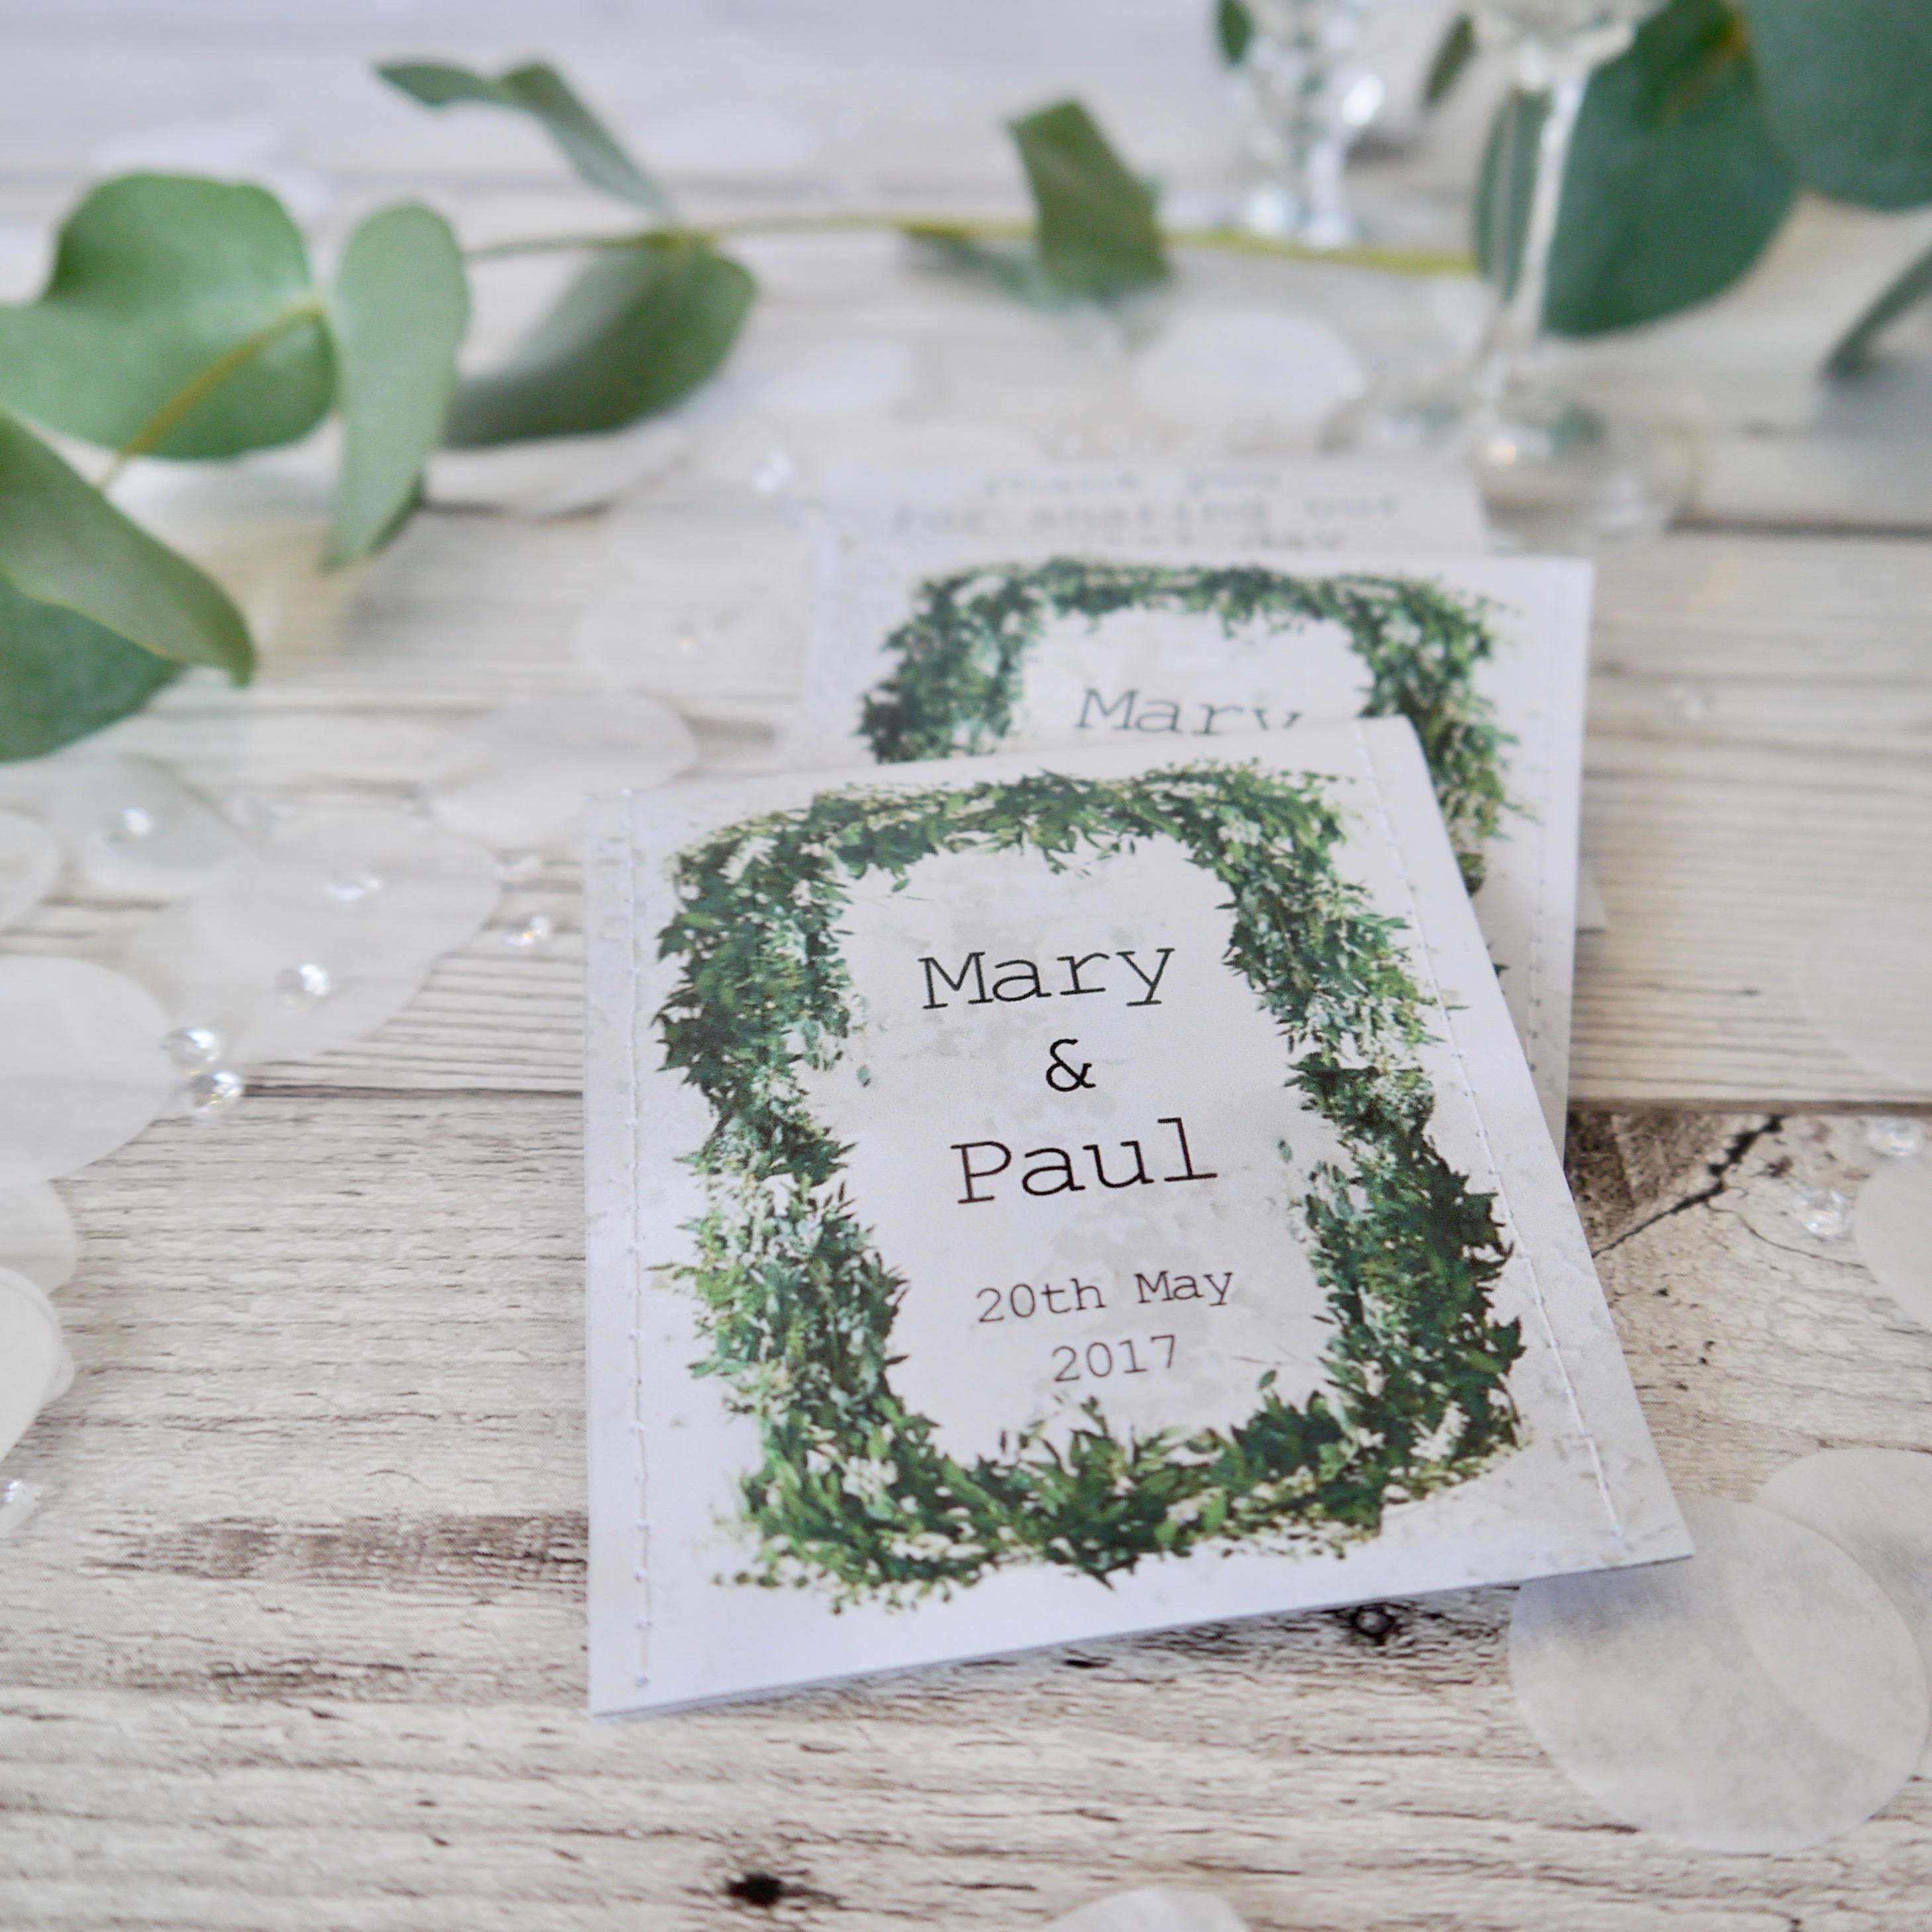 Teabag wedding favours with Mediterranean foliage design